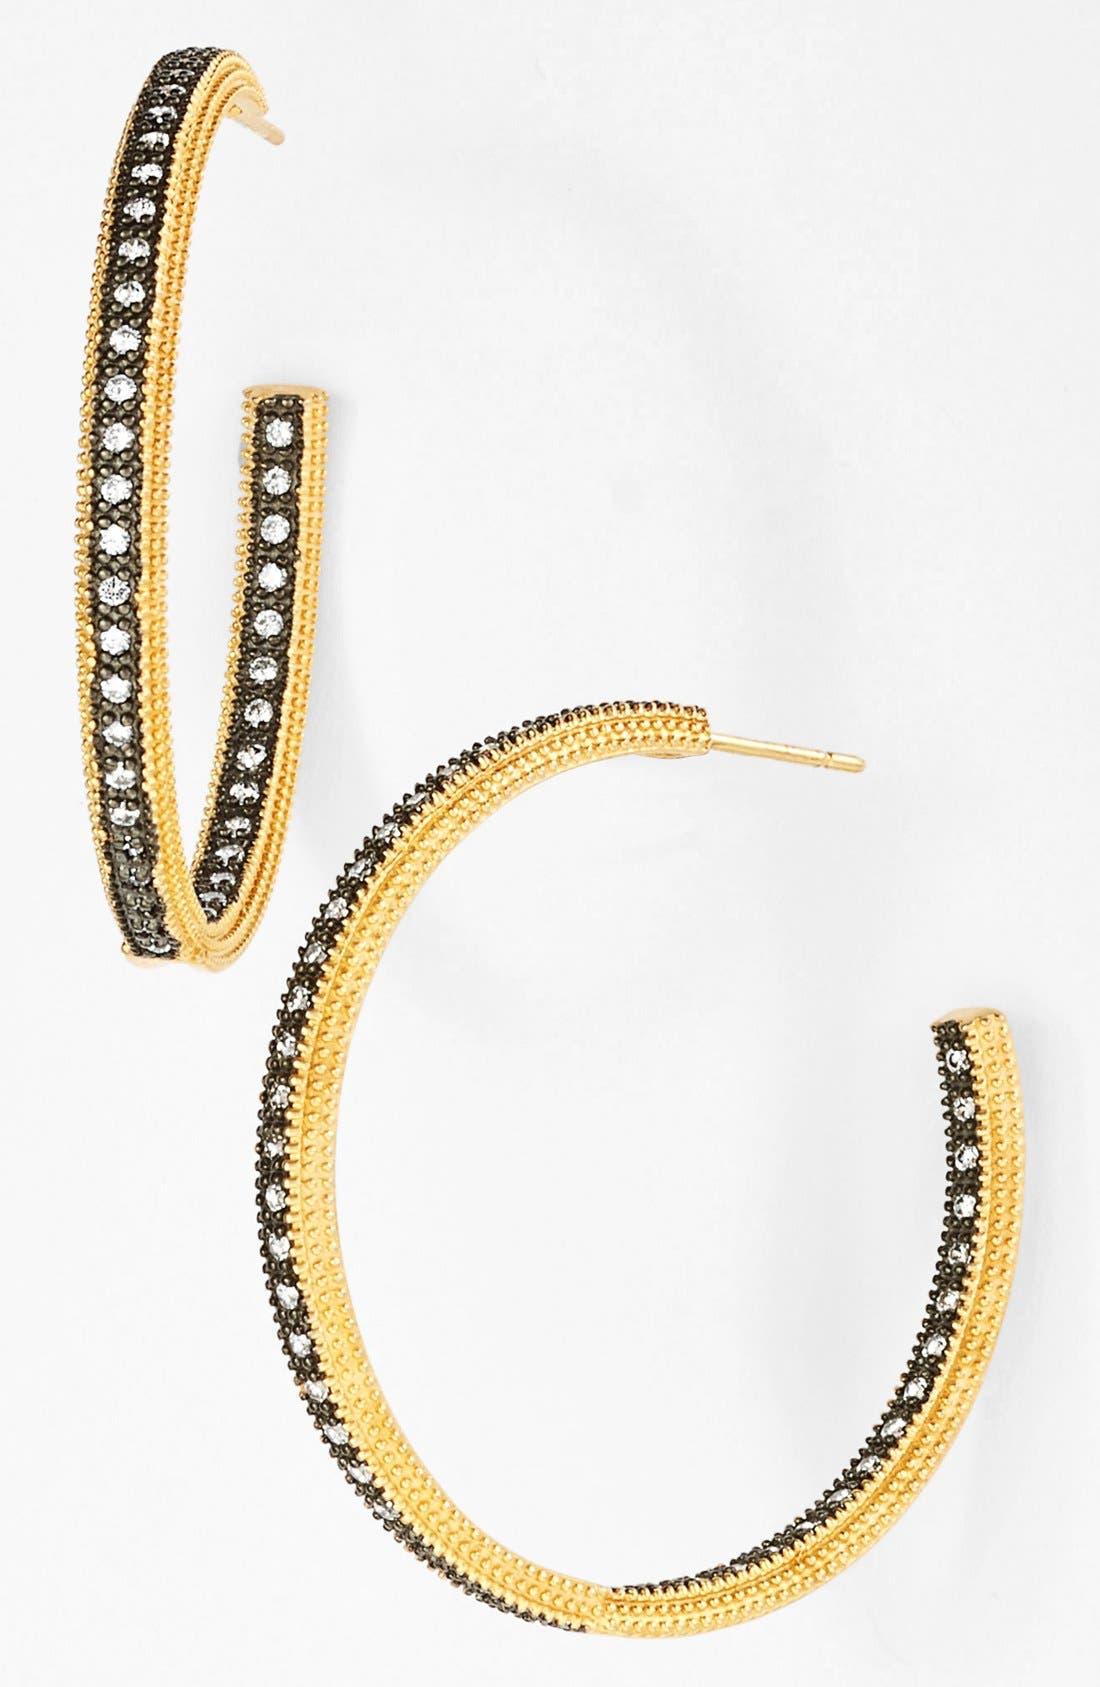 Main Image - FREIDA ROTHMAN 'The Standards' Inside Out Hoop Earrings